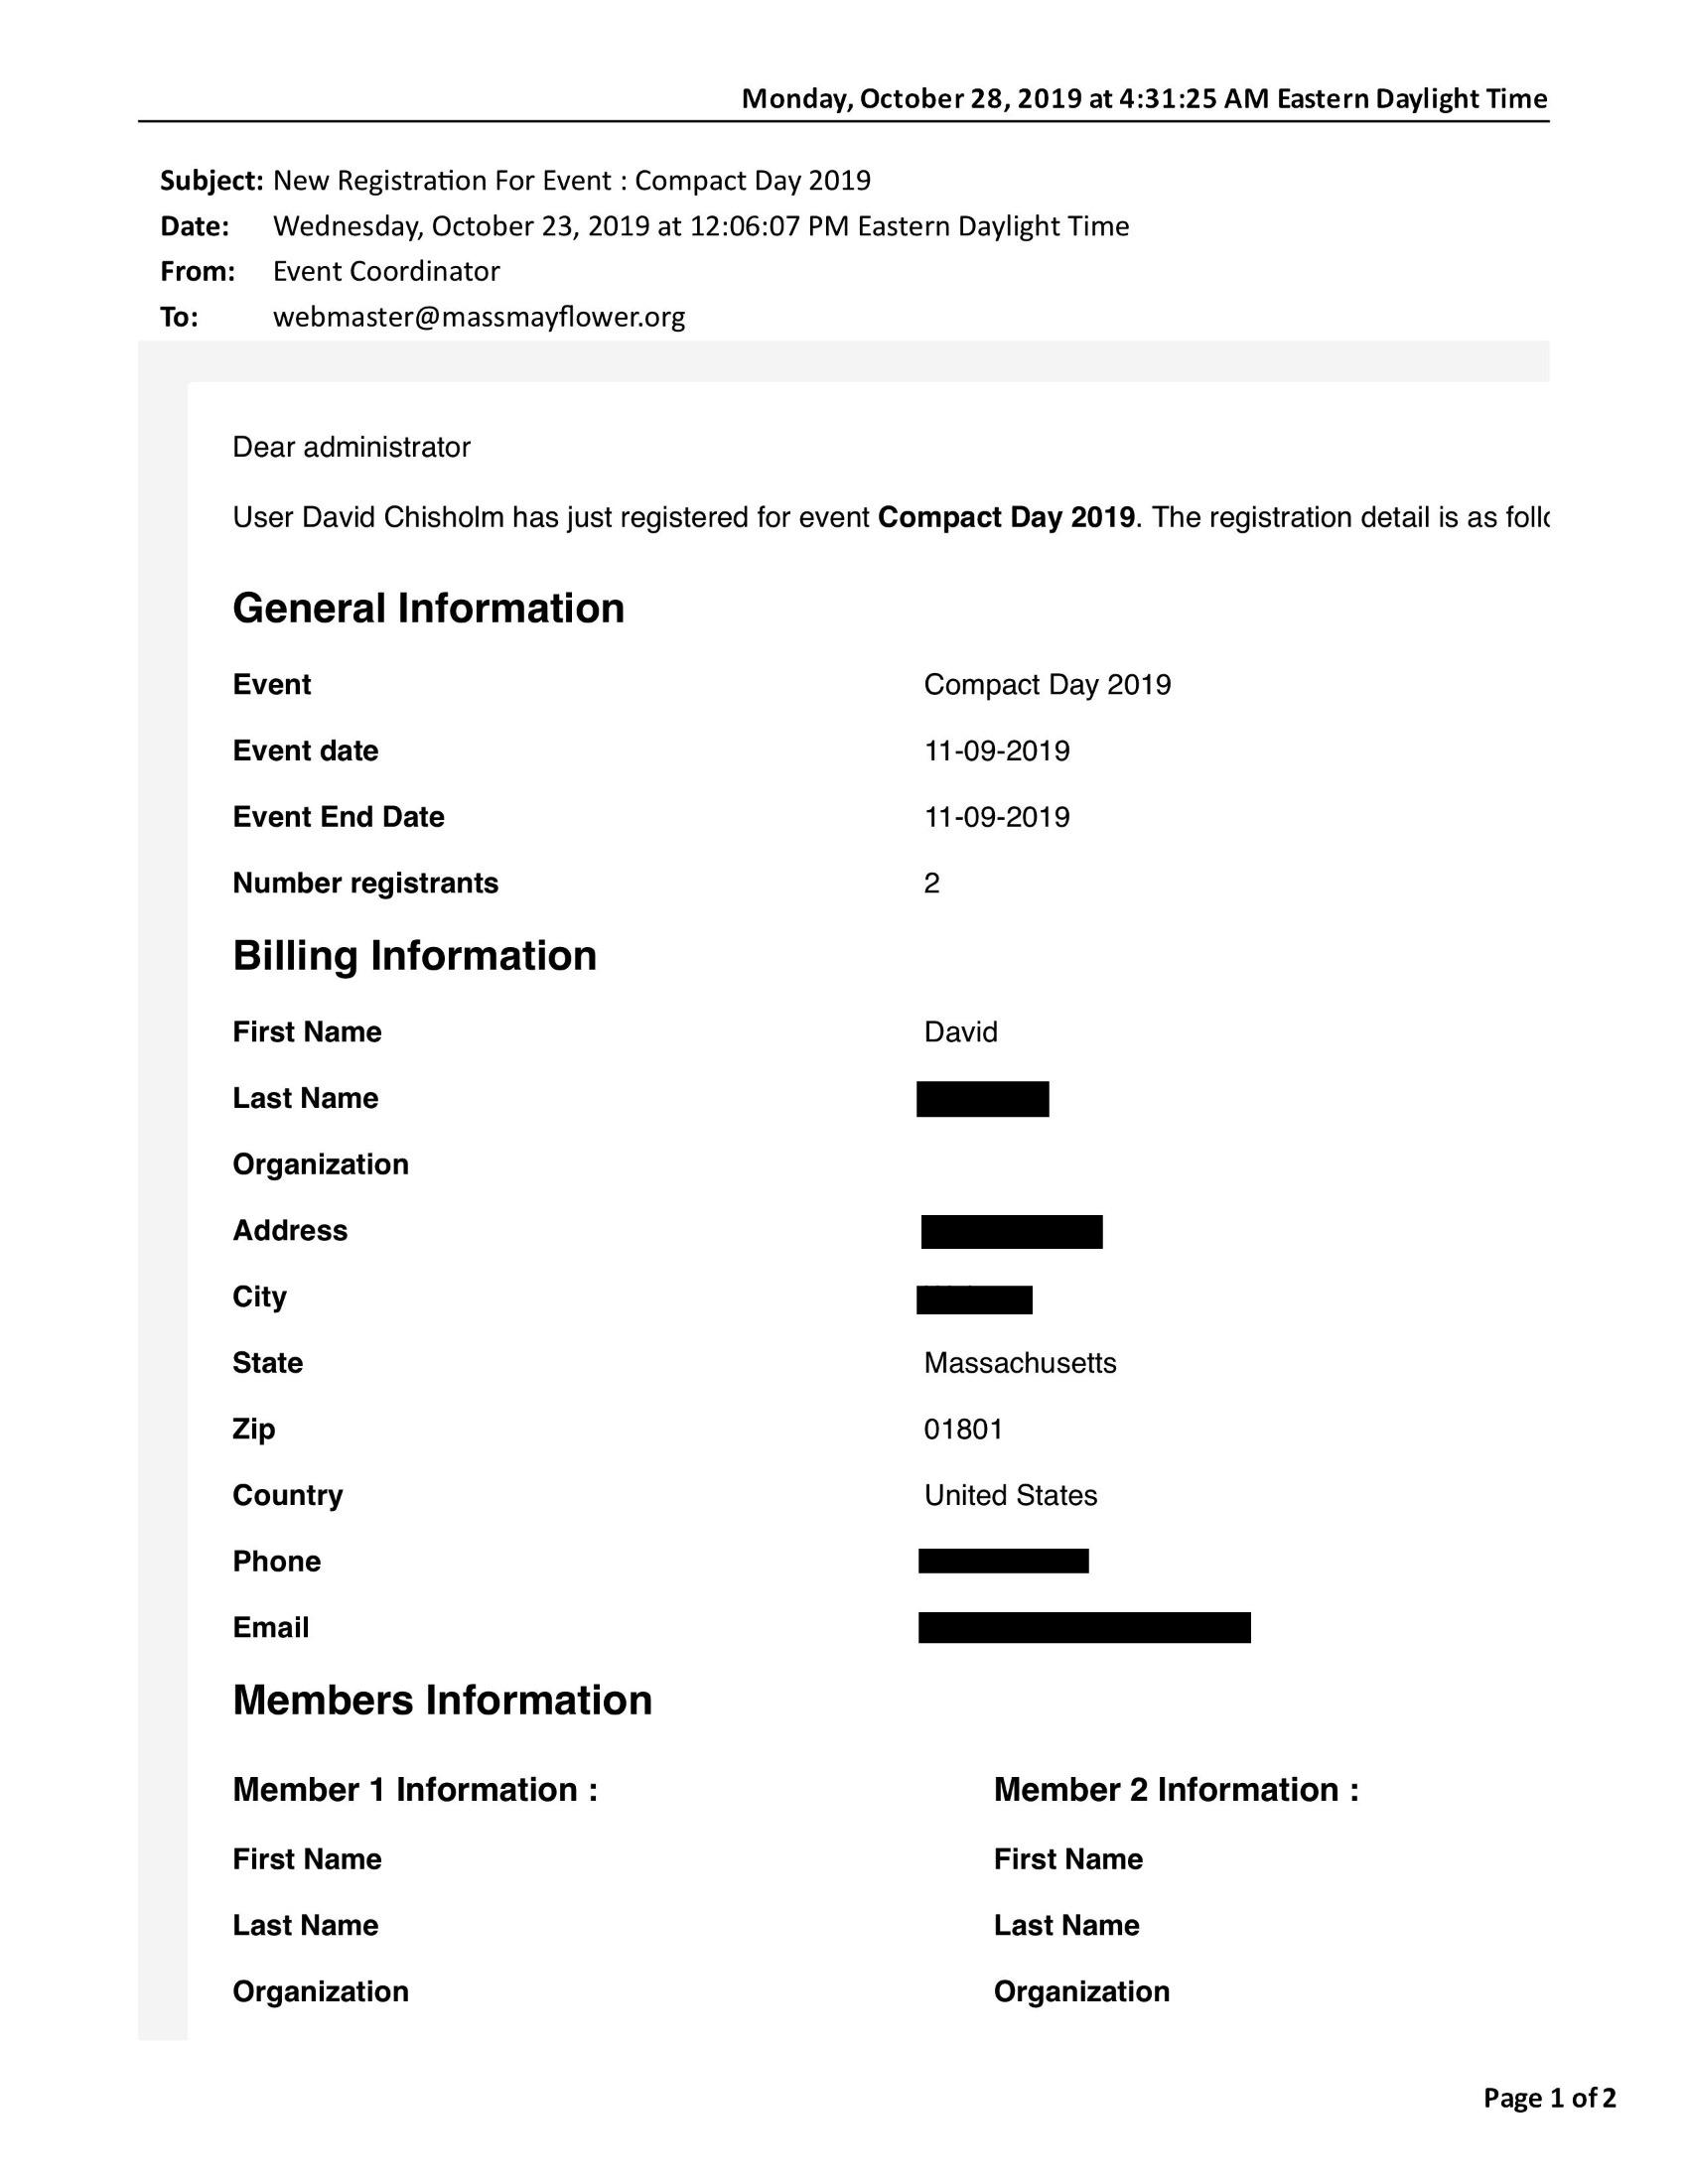 groupregistrationemail.jpg